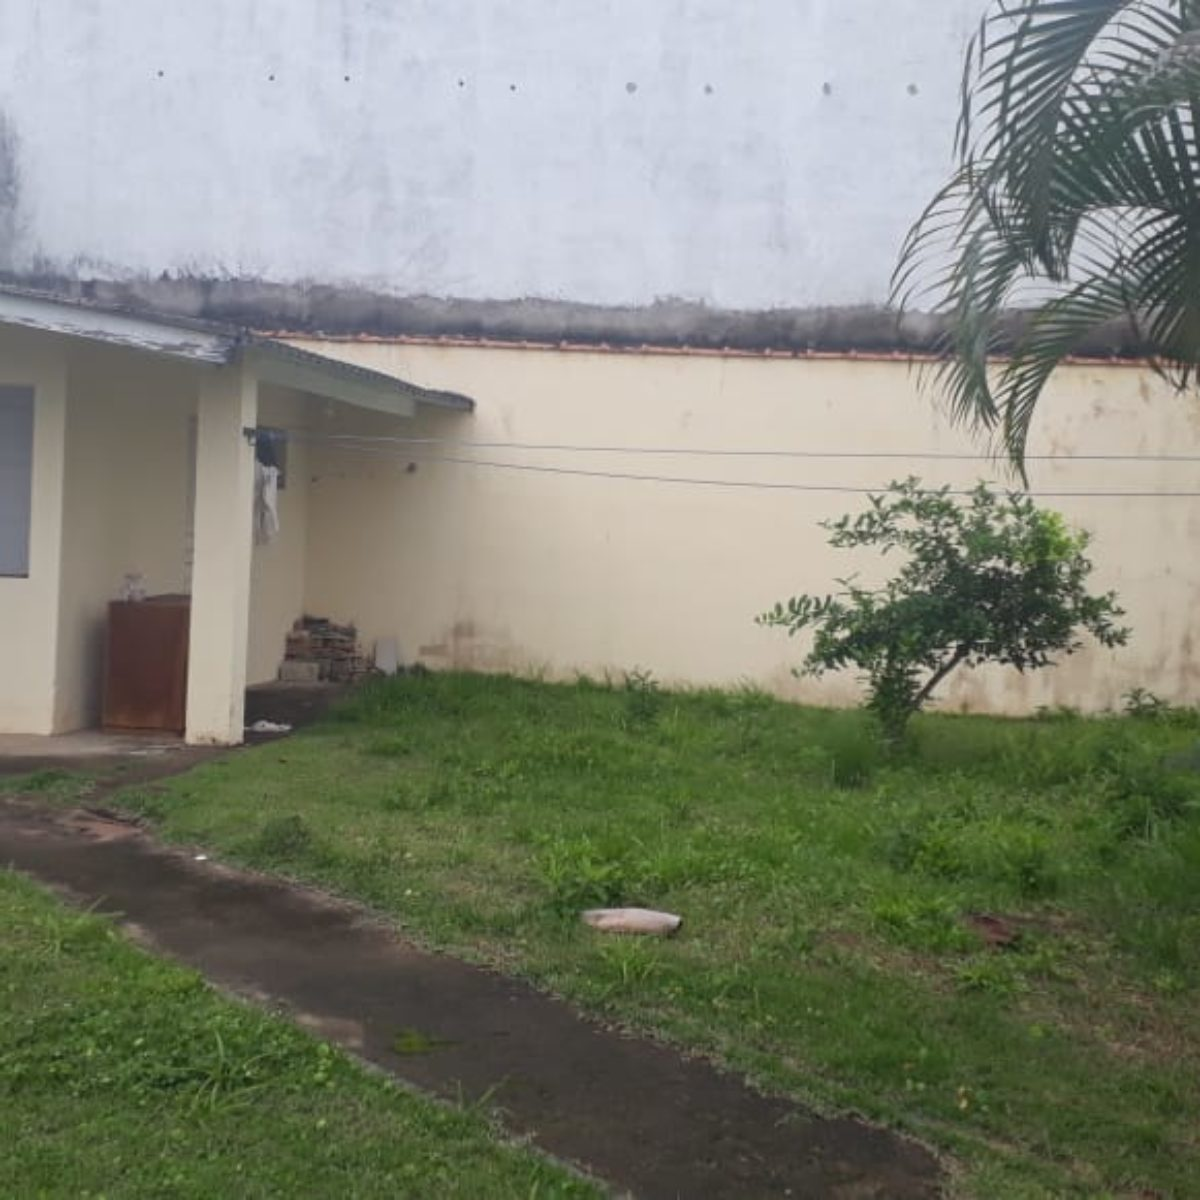 Ref.: Terreno Murado (80126) VENDIDO